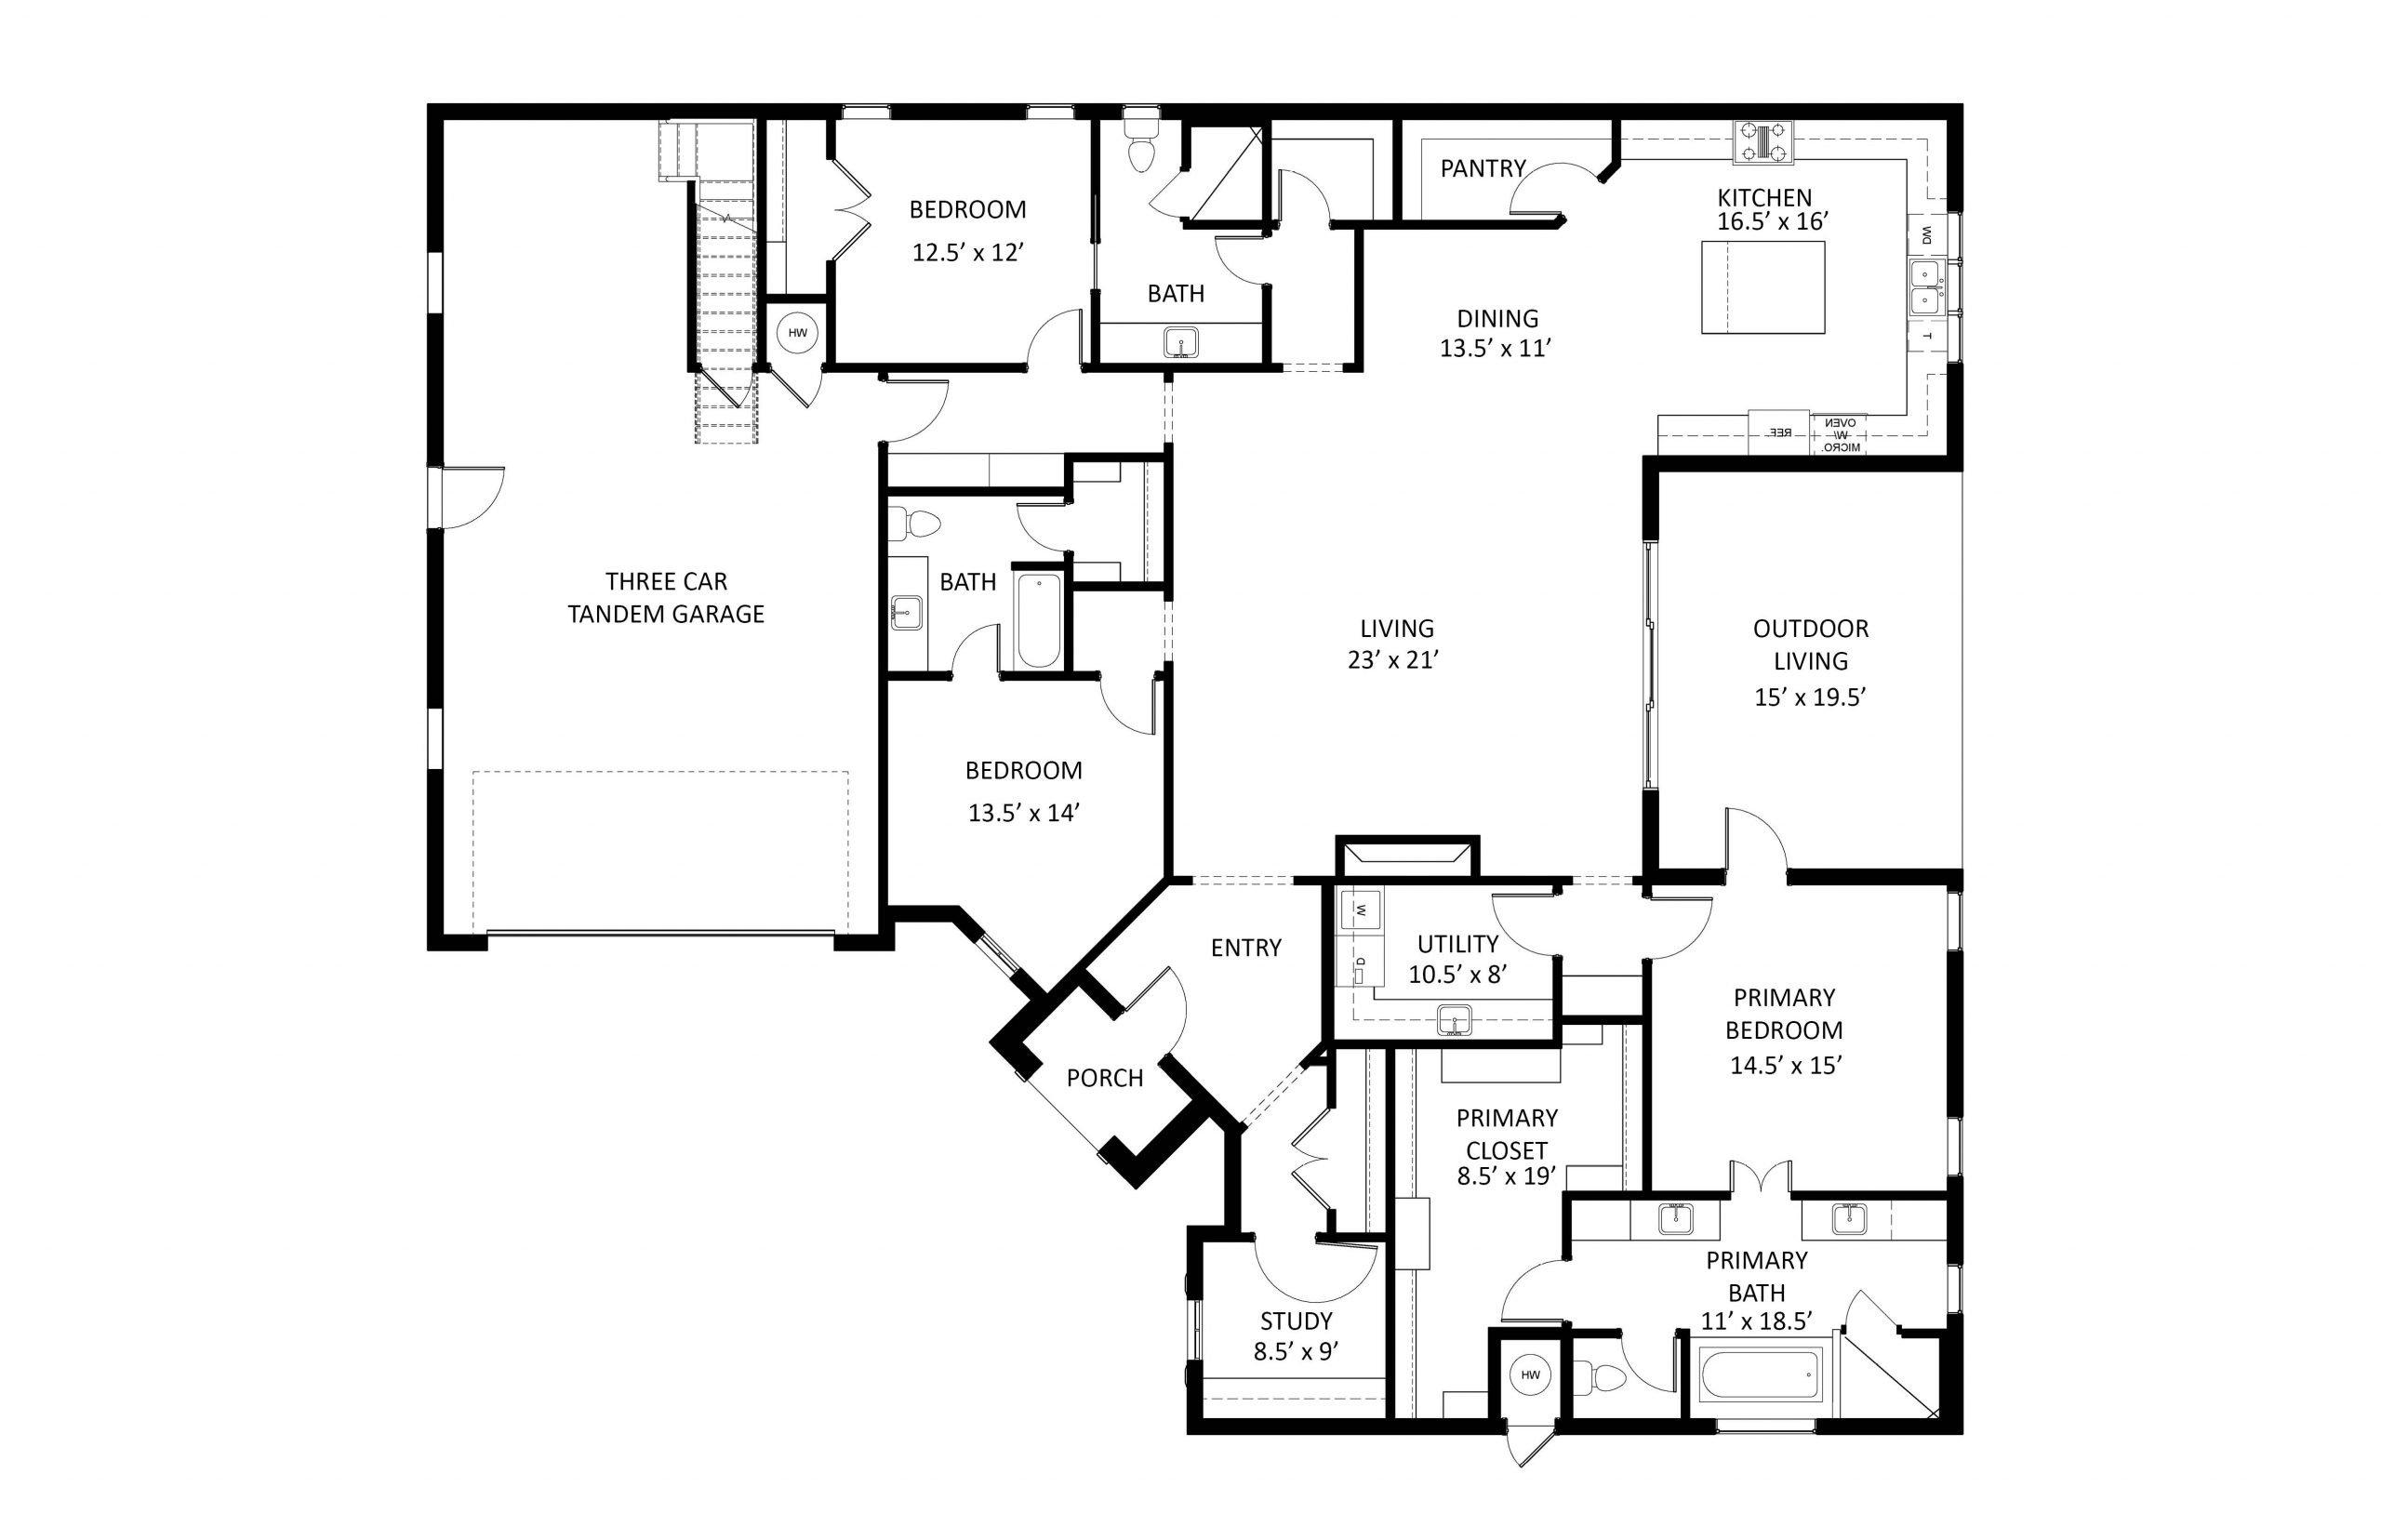 16424 Chablis - Corner - Labeled Floor Plan